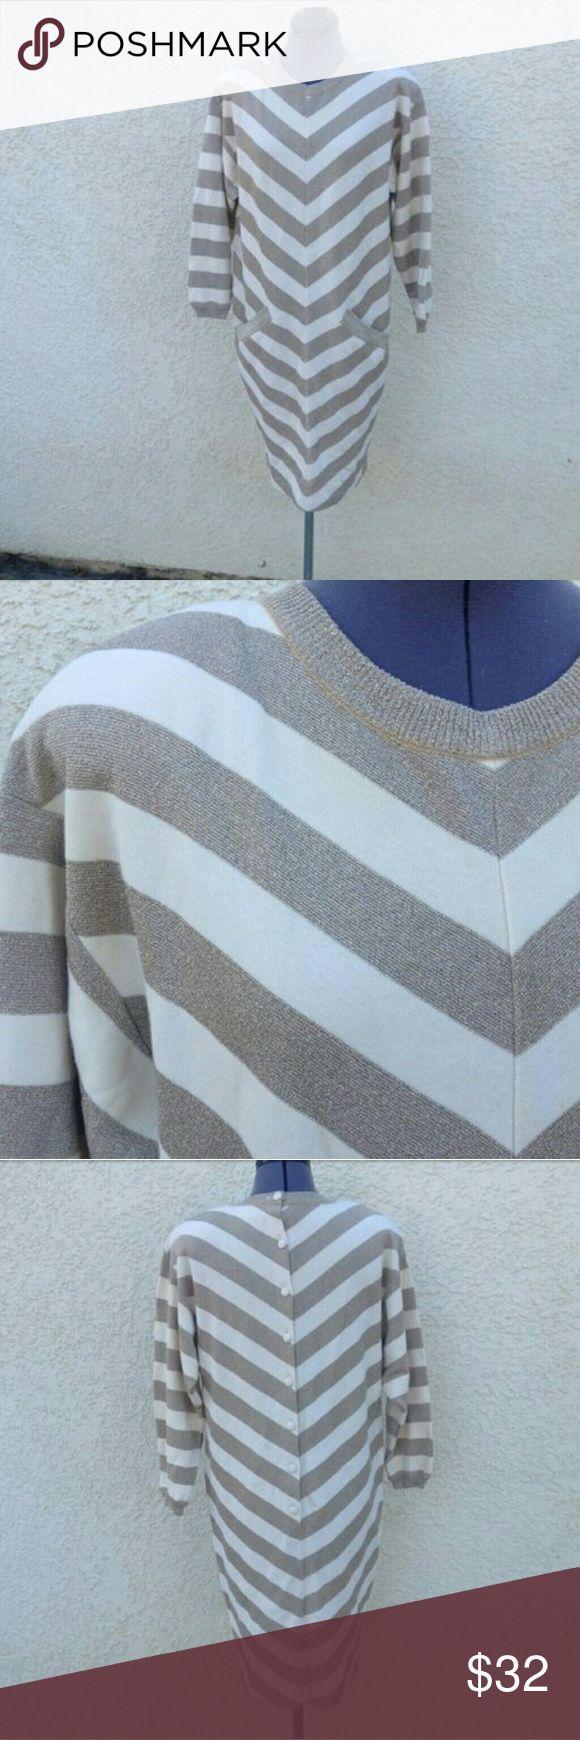 Spotted while shopping on Poshmark: Vintage 80s Bill Blass gold chevron knit dress! #poshmark #fashion #shopping #style #bill blass #Dresses & Skirts